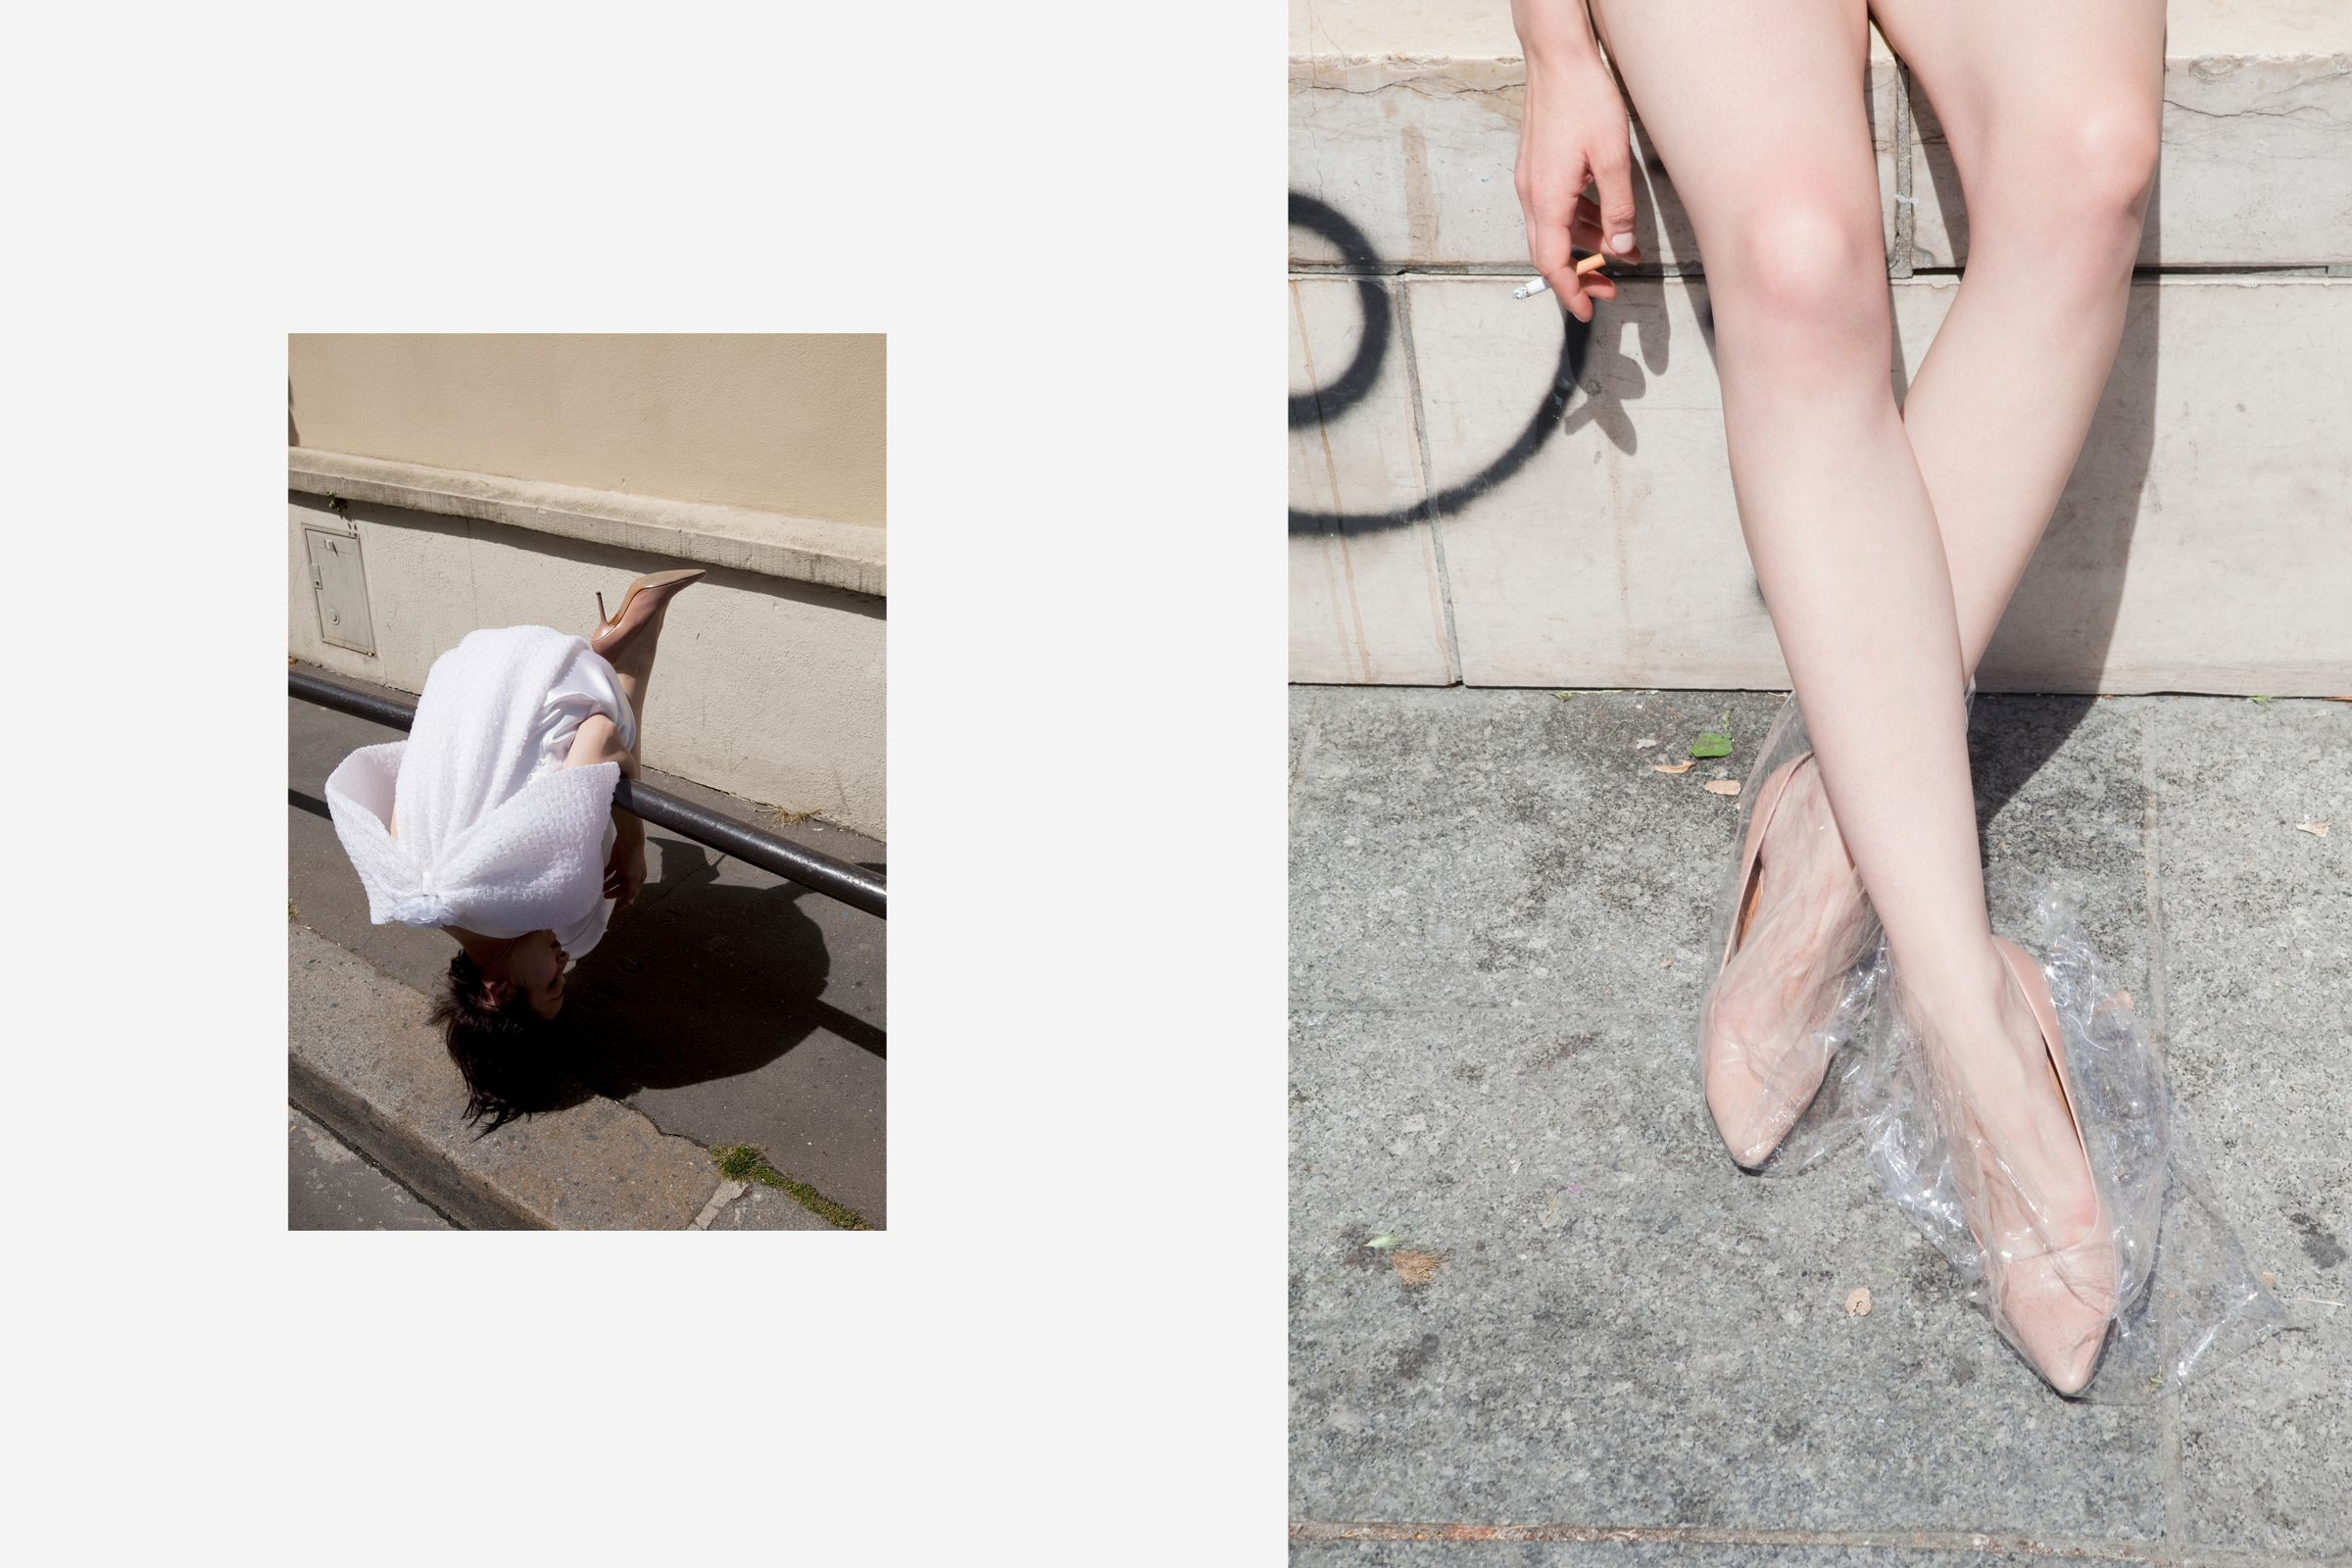 Rika Magazine issue no. 15 Roxane Danset photographed by Viviane Sassen